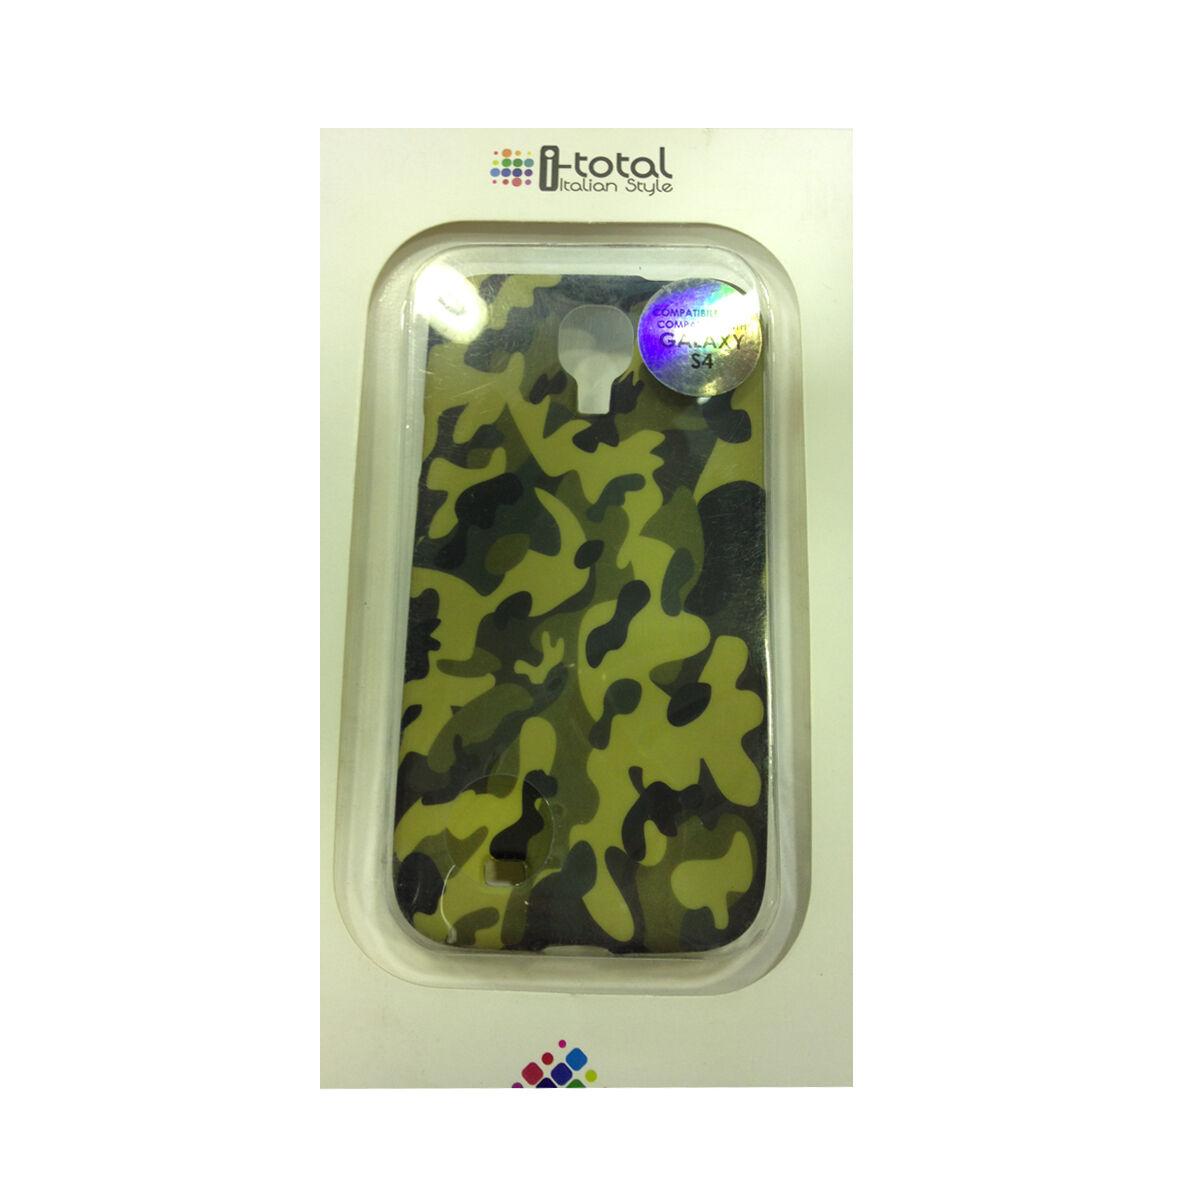 COVER mascherina SAMSUNG GALAXY S4 camouflage verde in silicone morbida I-TOTAL